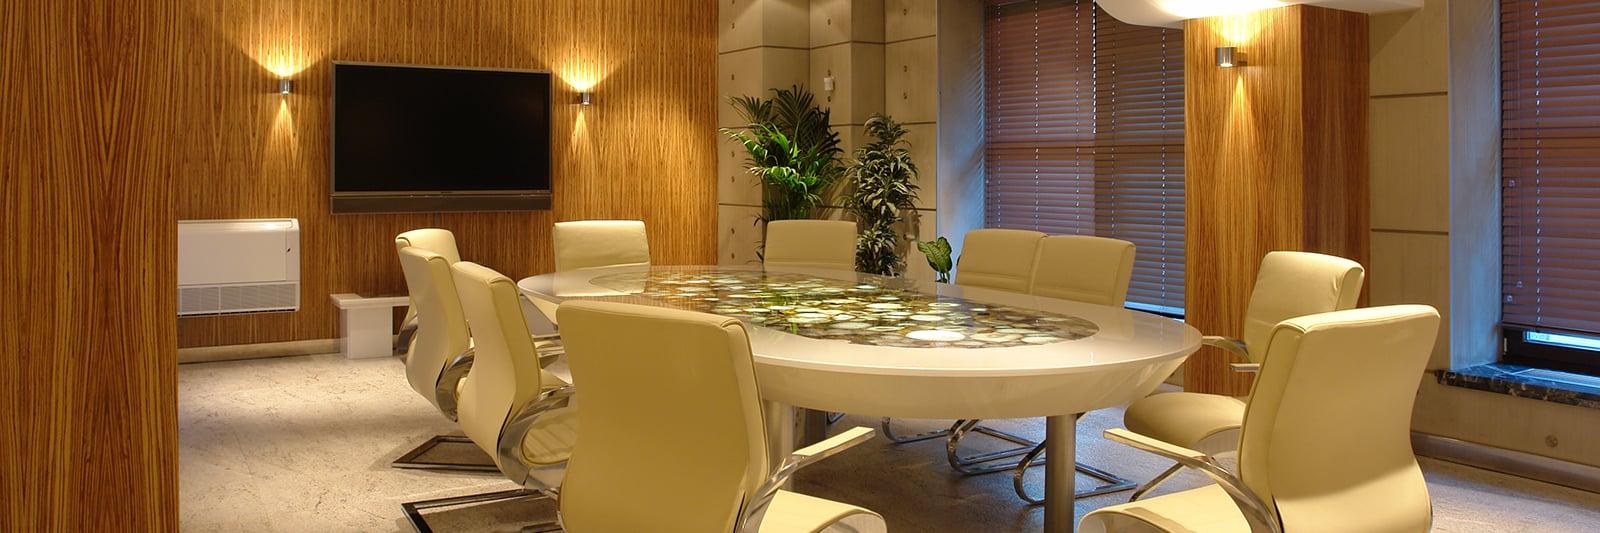 bigstock-office-6983070 (1)_1600x533